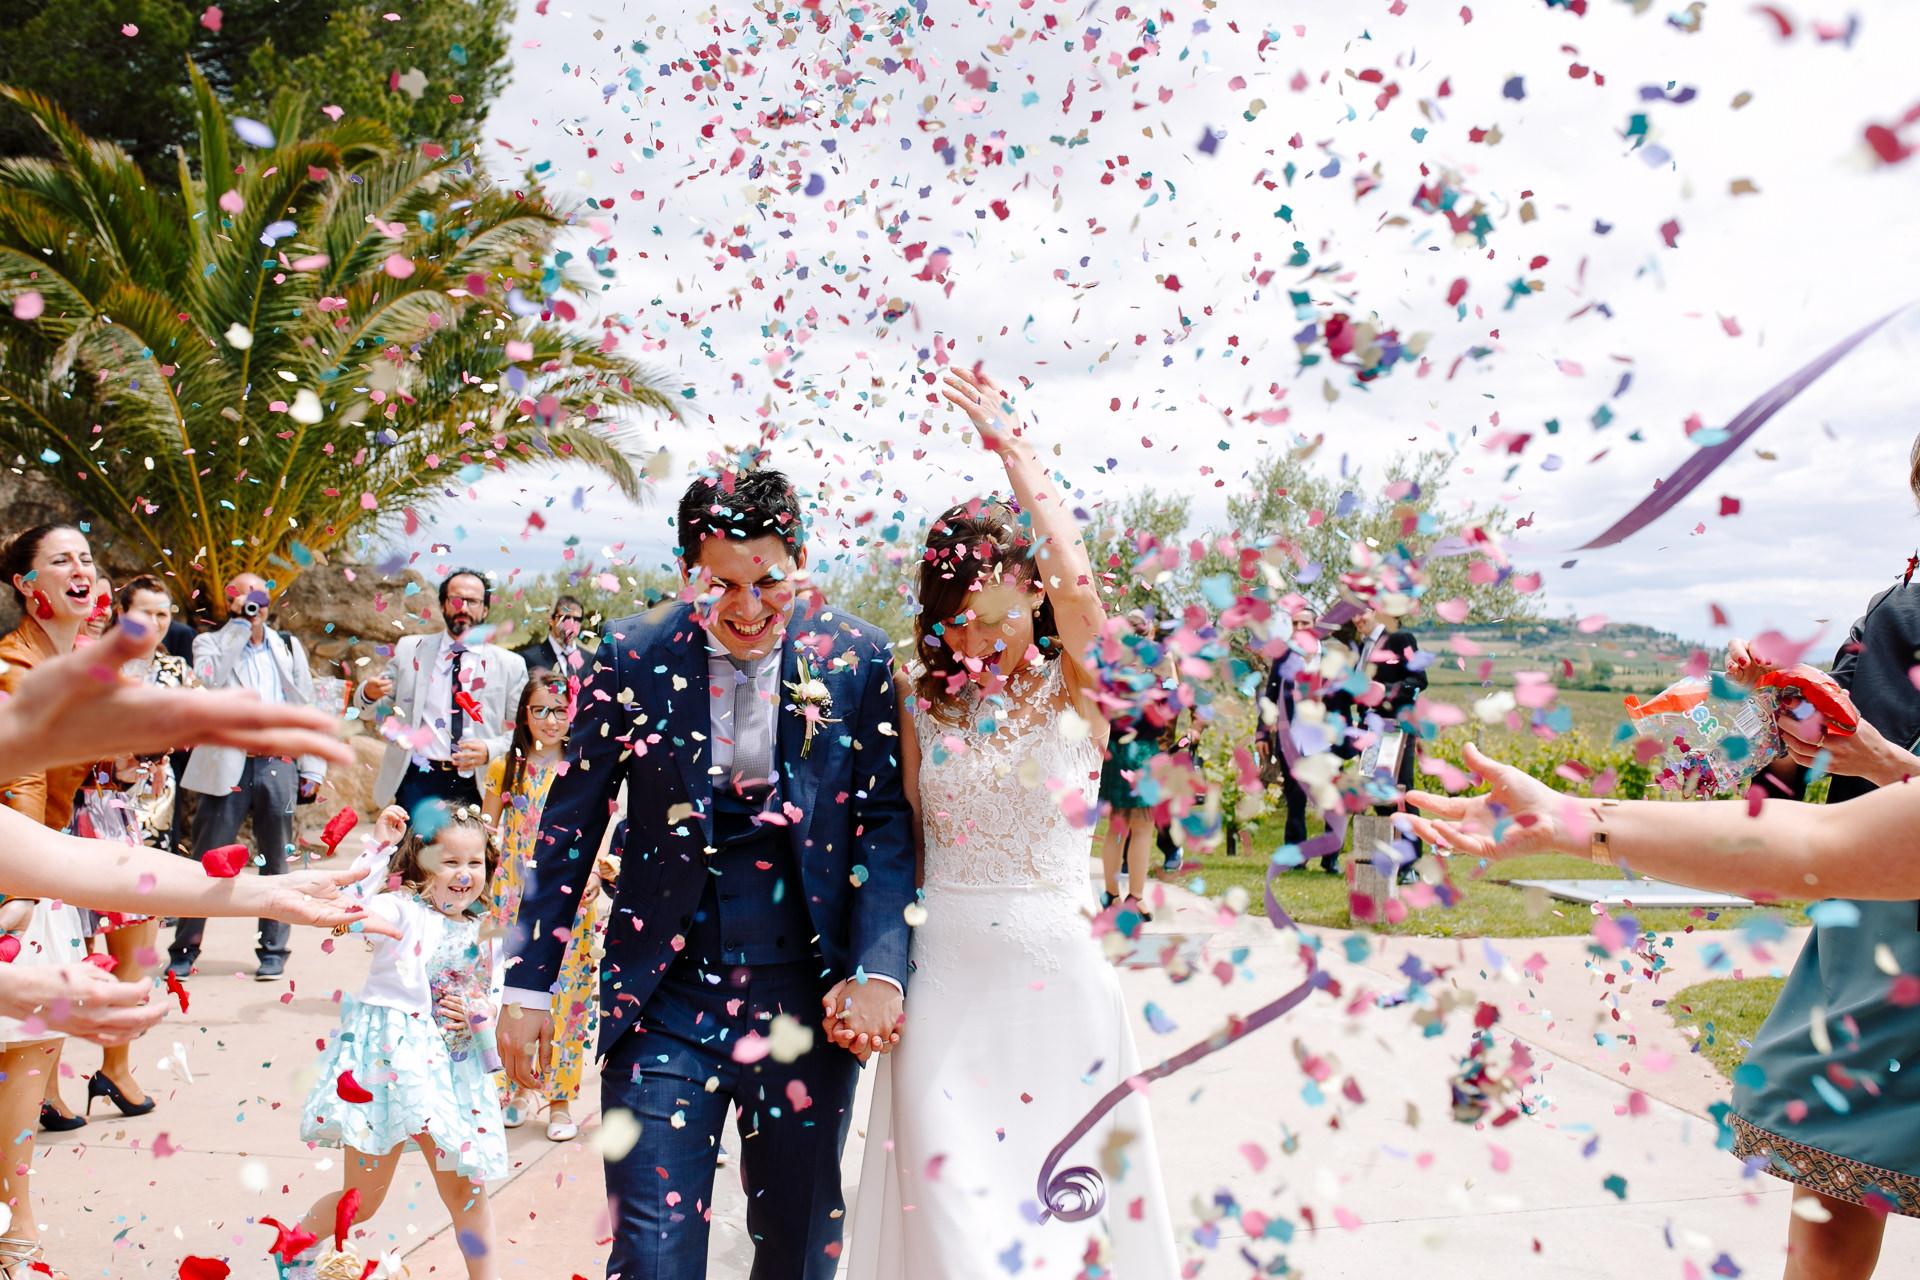 boda civil eguren ugarte la rioja 144302